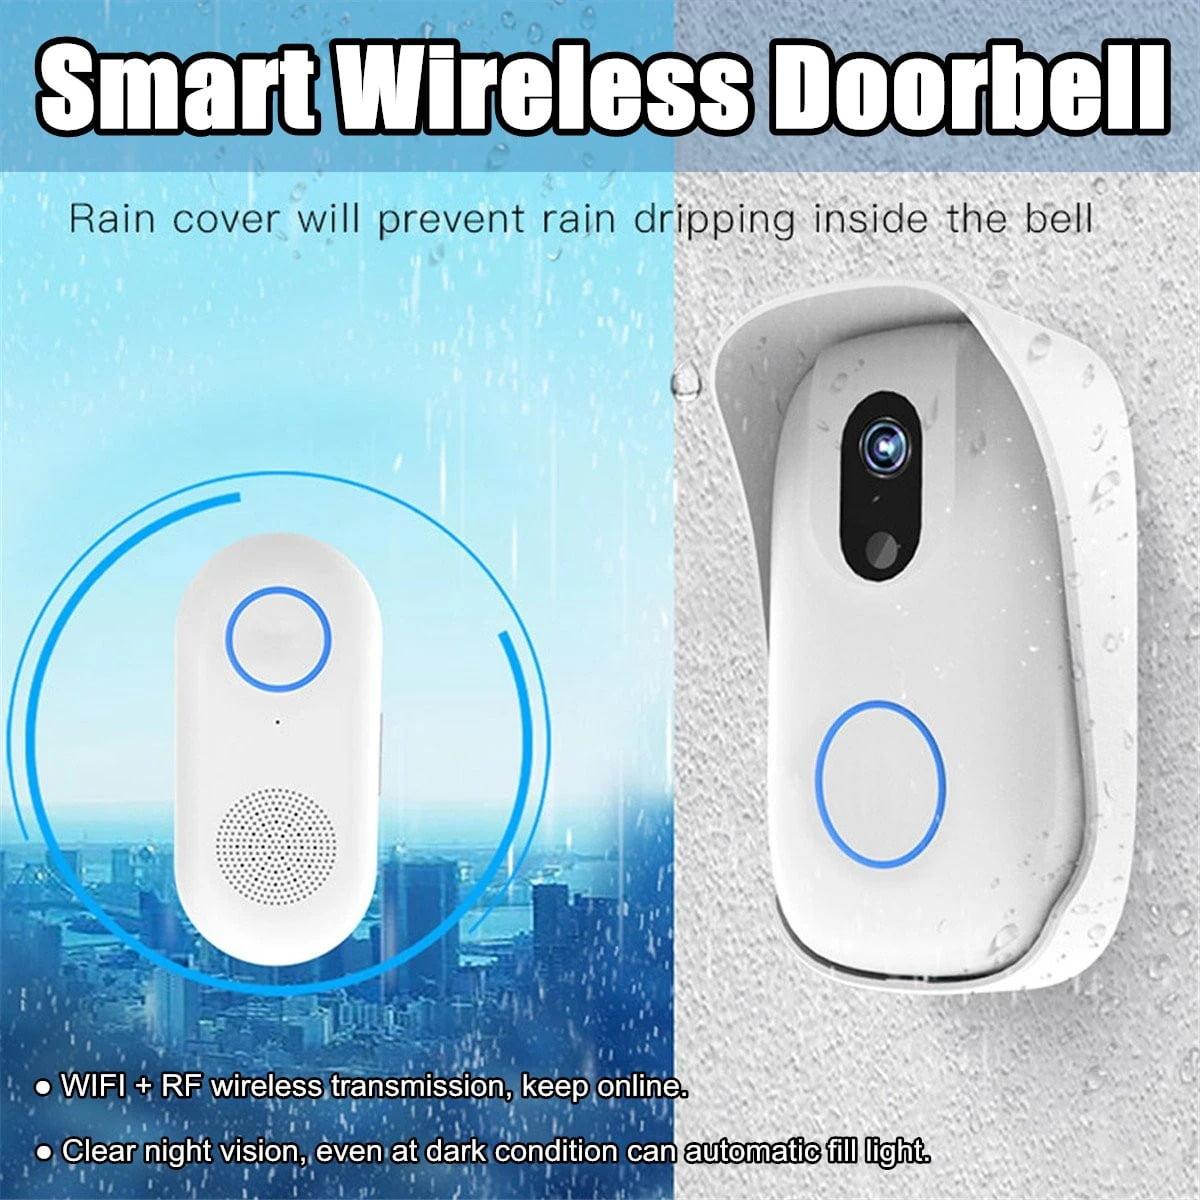 SH02 Smart Wireless Doorbell Lens Video HD Security Camera Night Vision App Control (17)